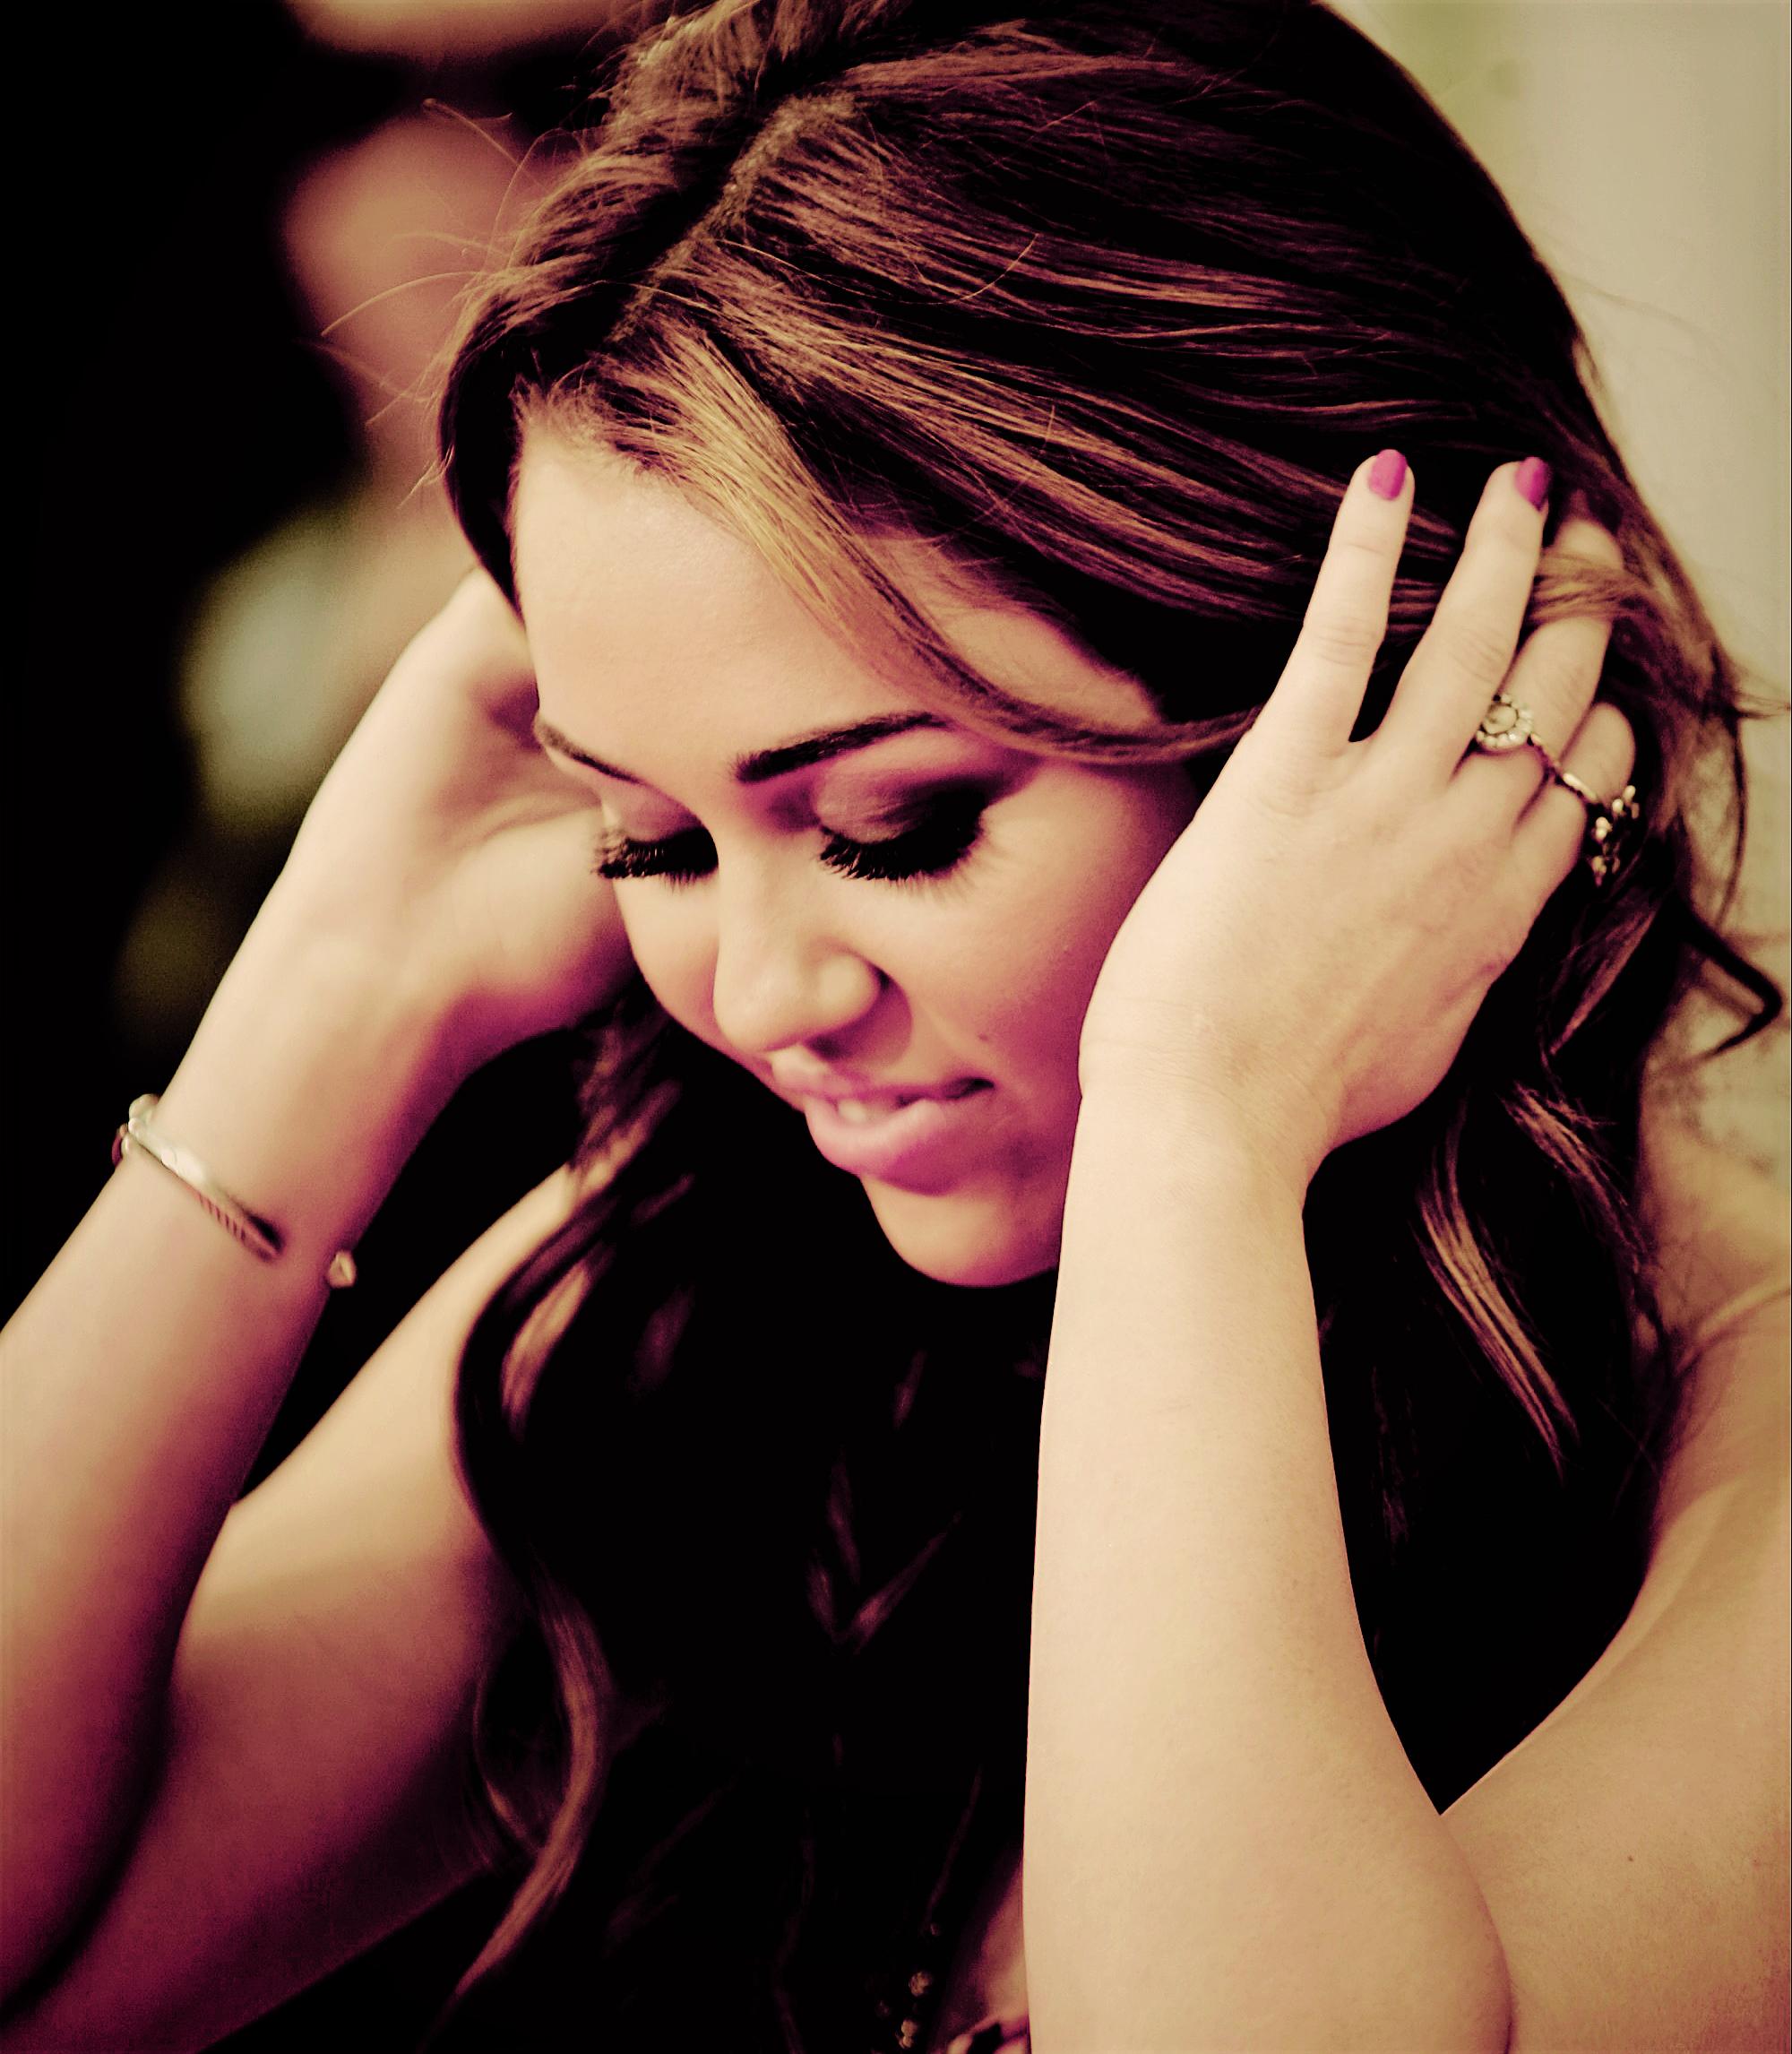 PSD Miley Cyrus by radiatelovecyrus